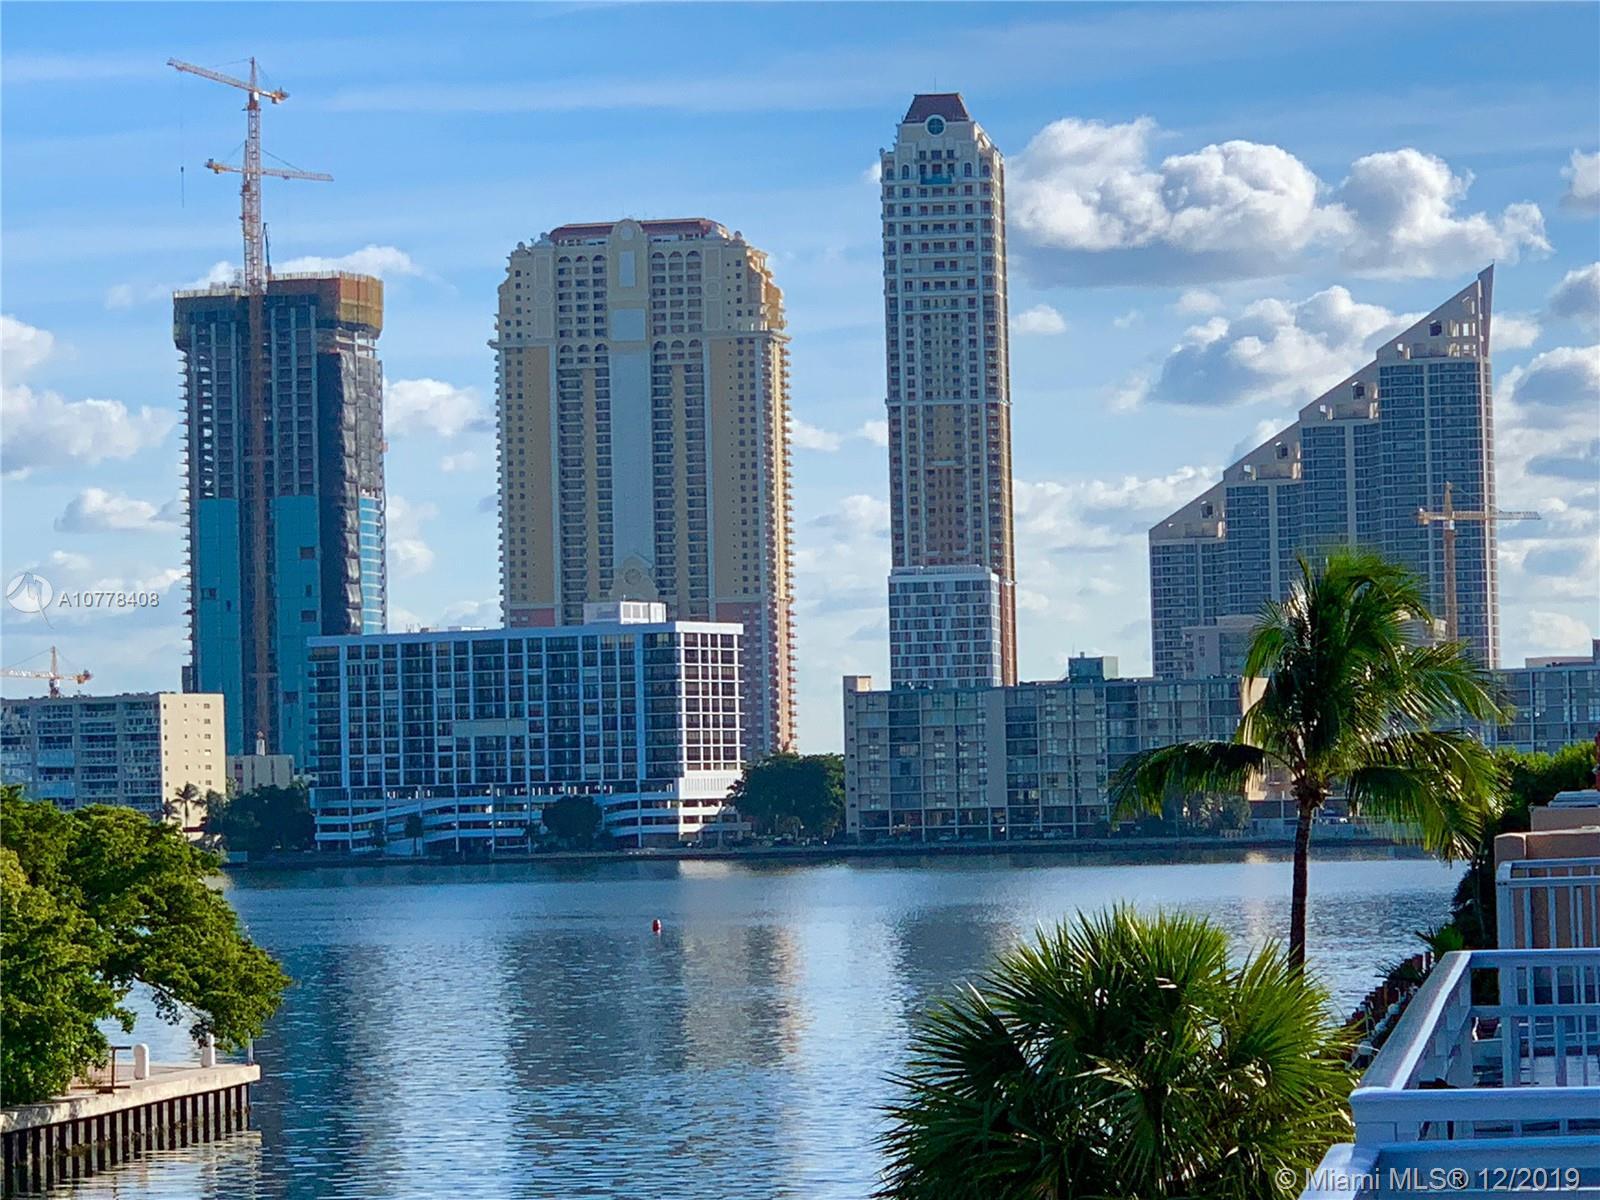 3745 NE 171st St, 60 - North Miami Beach, Florida